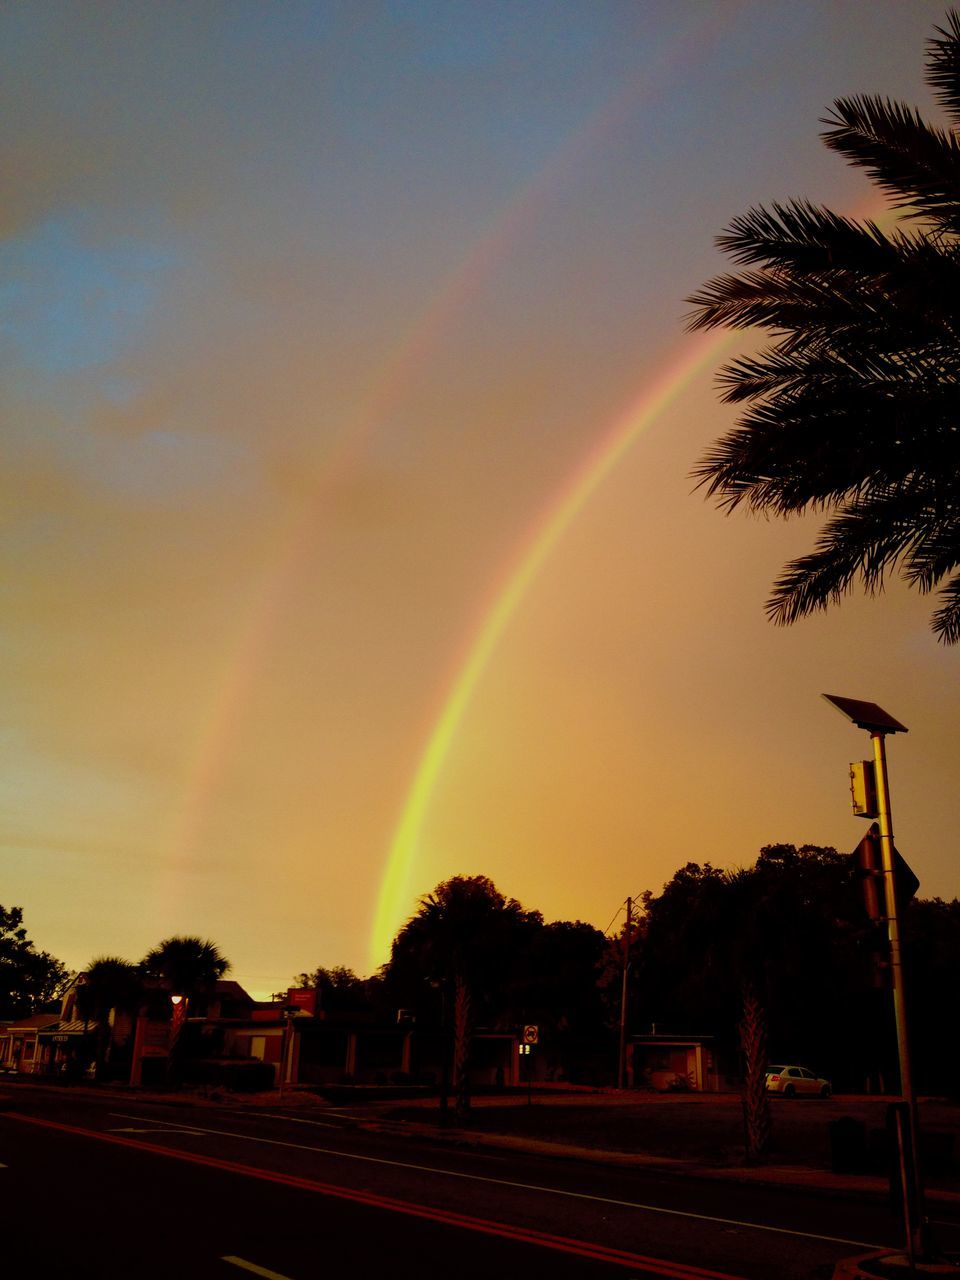 rainbow, tree, sky, sunset, double rainbow, scenics, outdoors, no people, road, street light, beauty in nature, nature, day